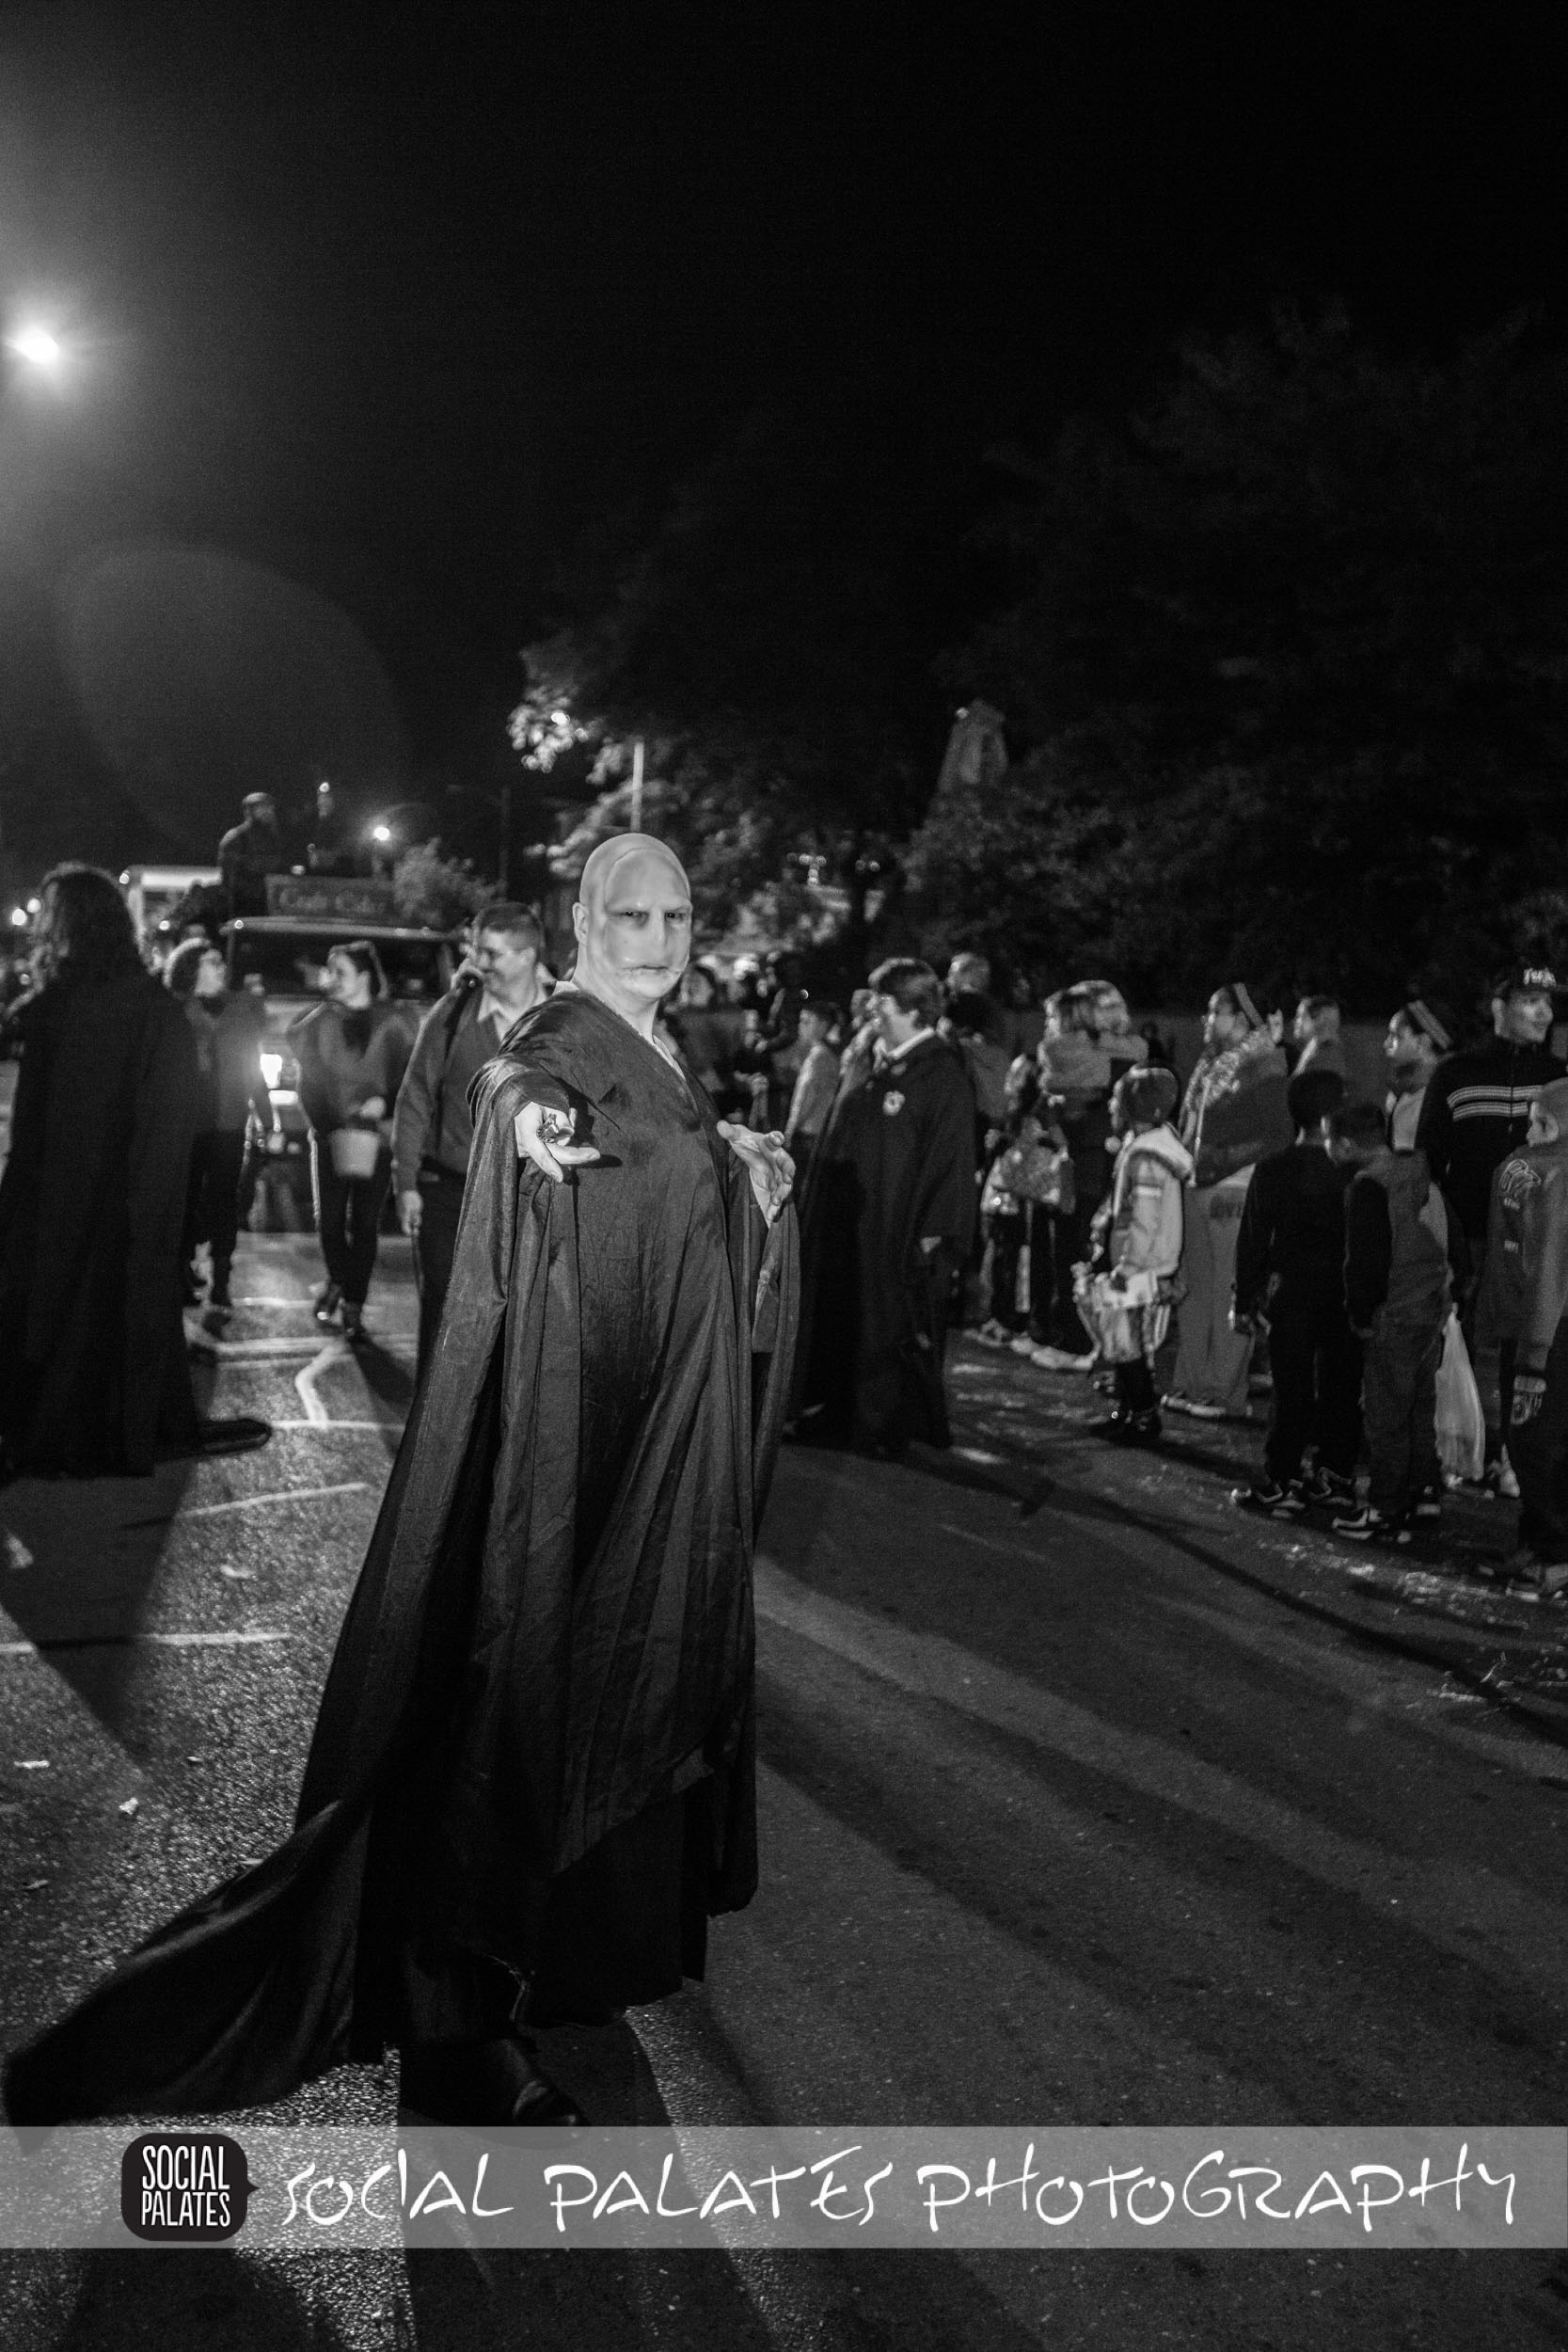 Haunted Happenings Parade 2014 Creative Salem by Social Palates-7889.jpg